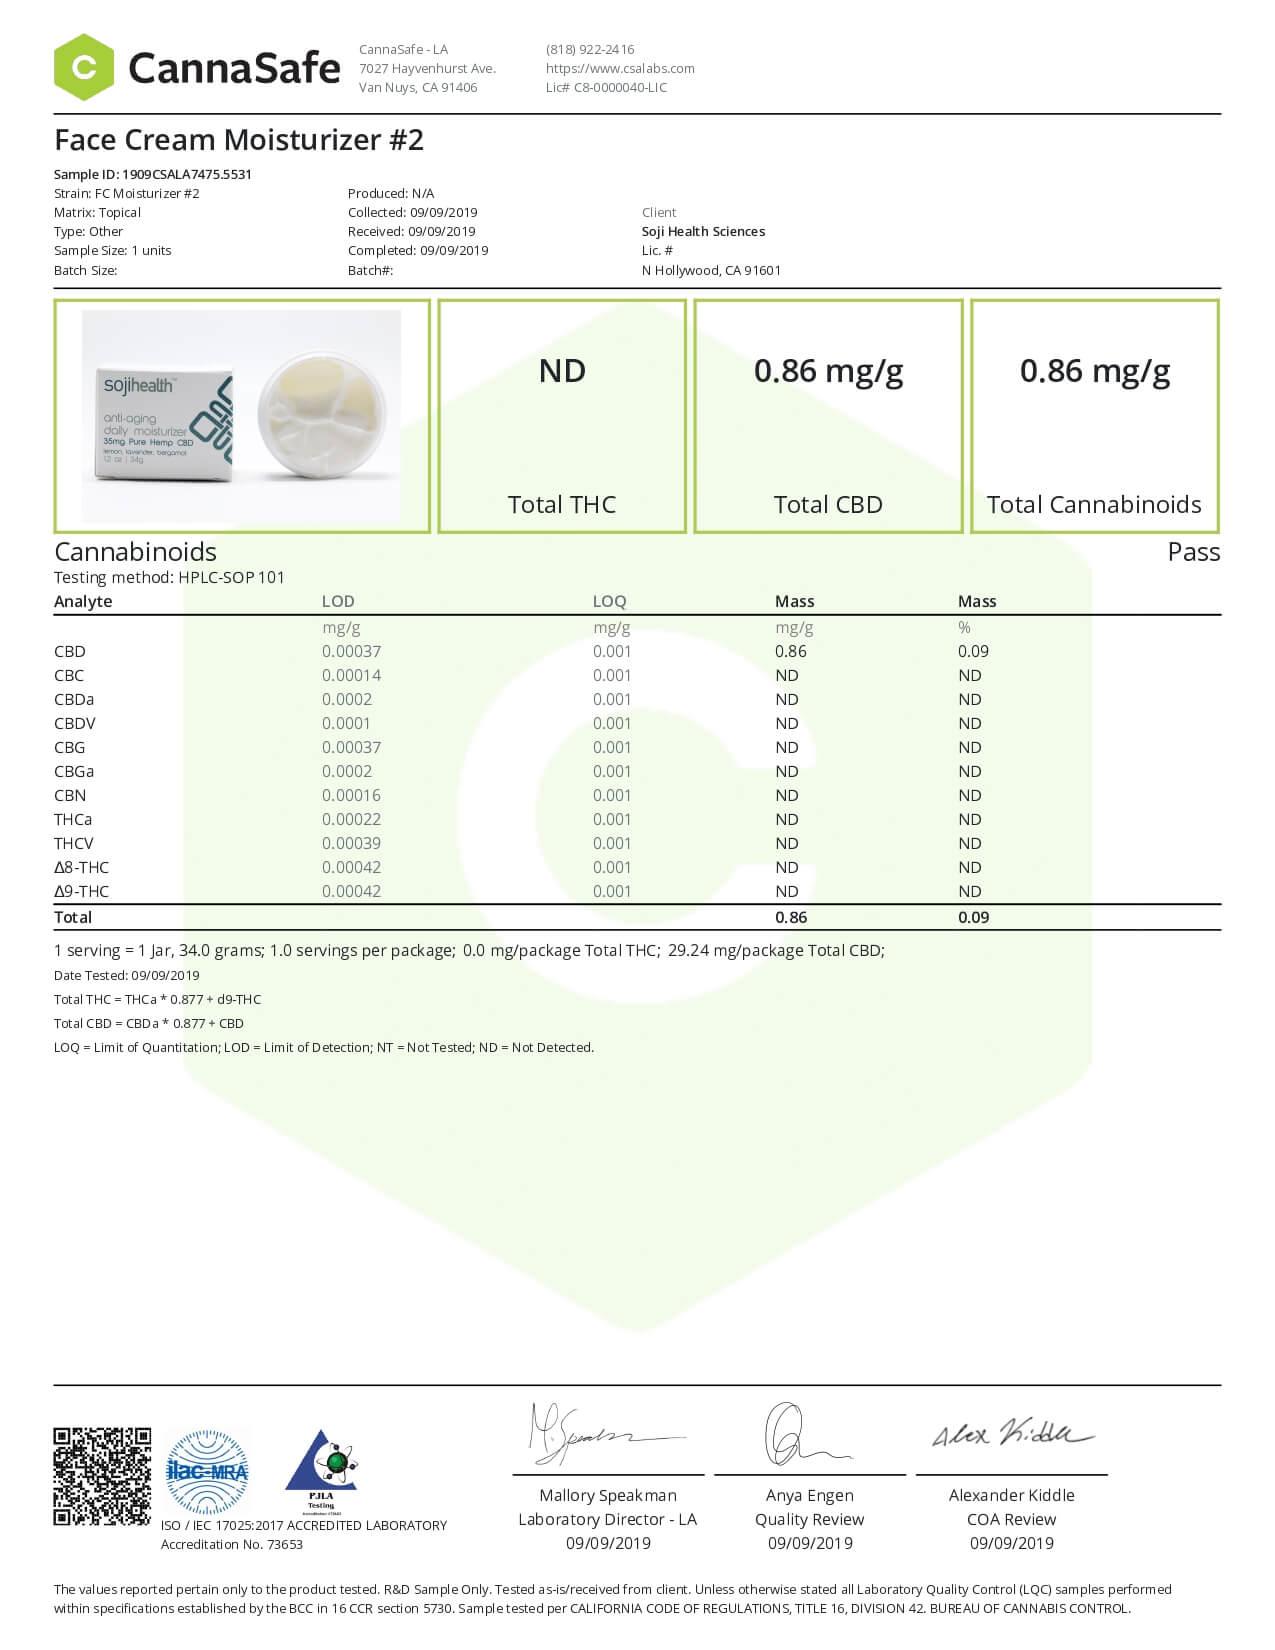 Soji Health CBD Topical Lemon Lavender Face Cream Lab Report